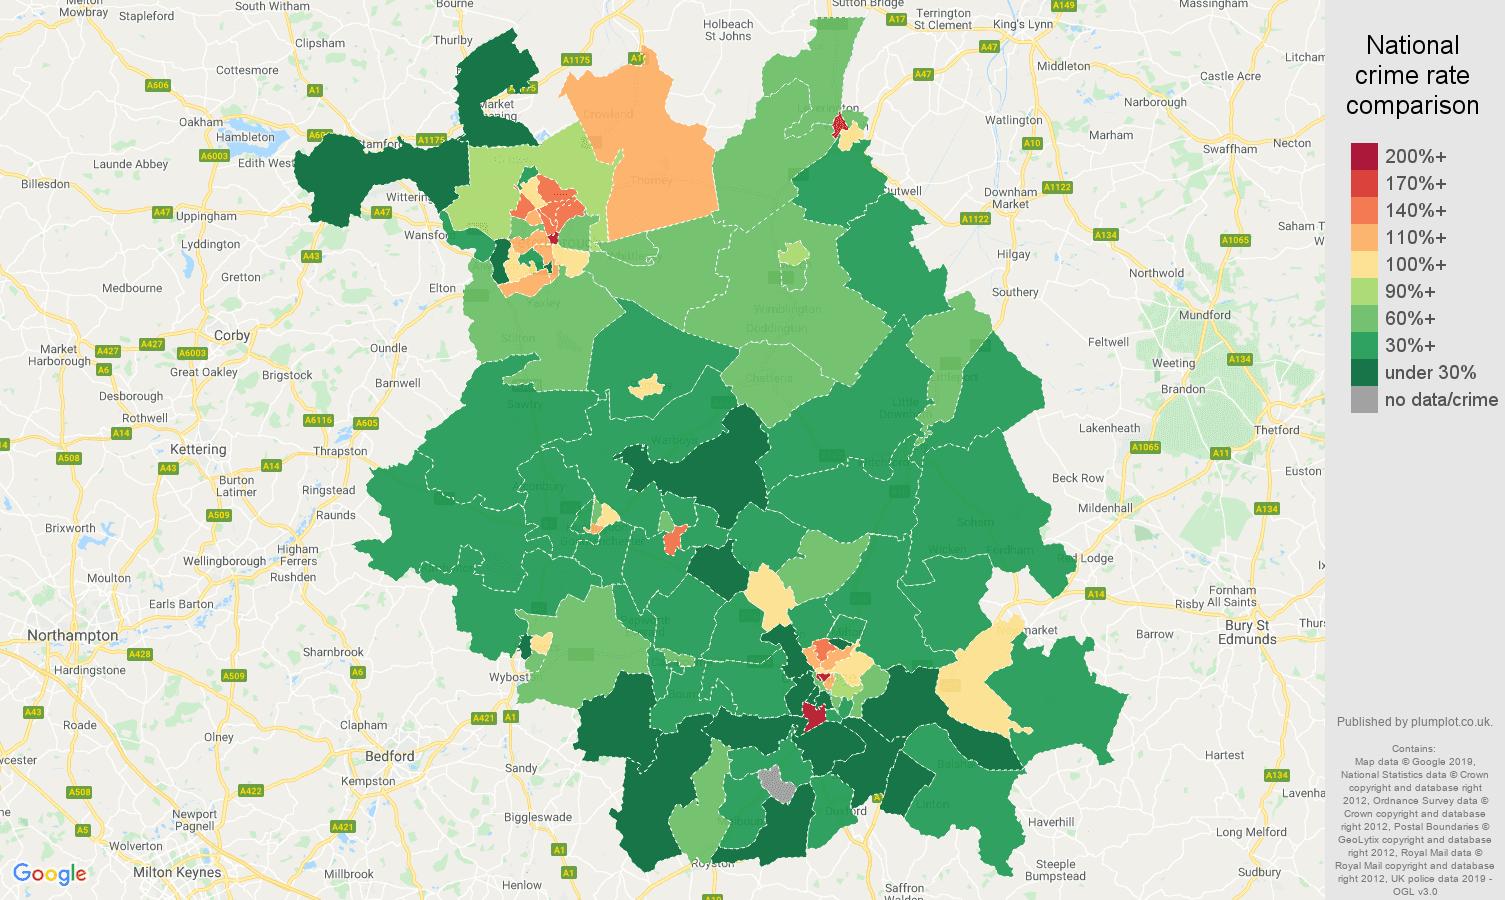 Cambridgeshire public order crime rate comparison map